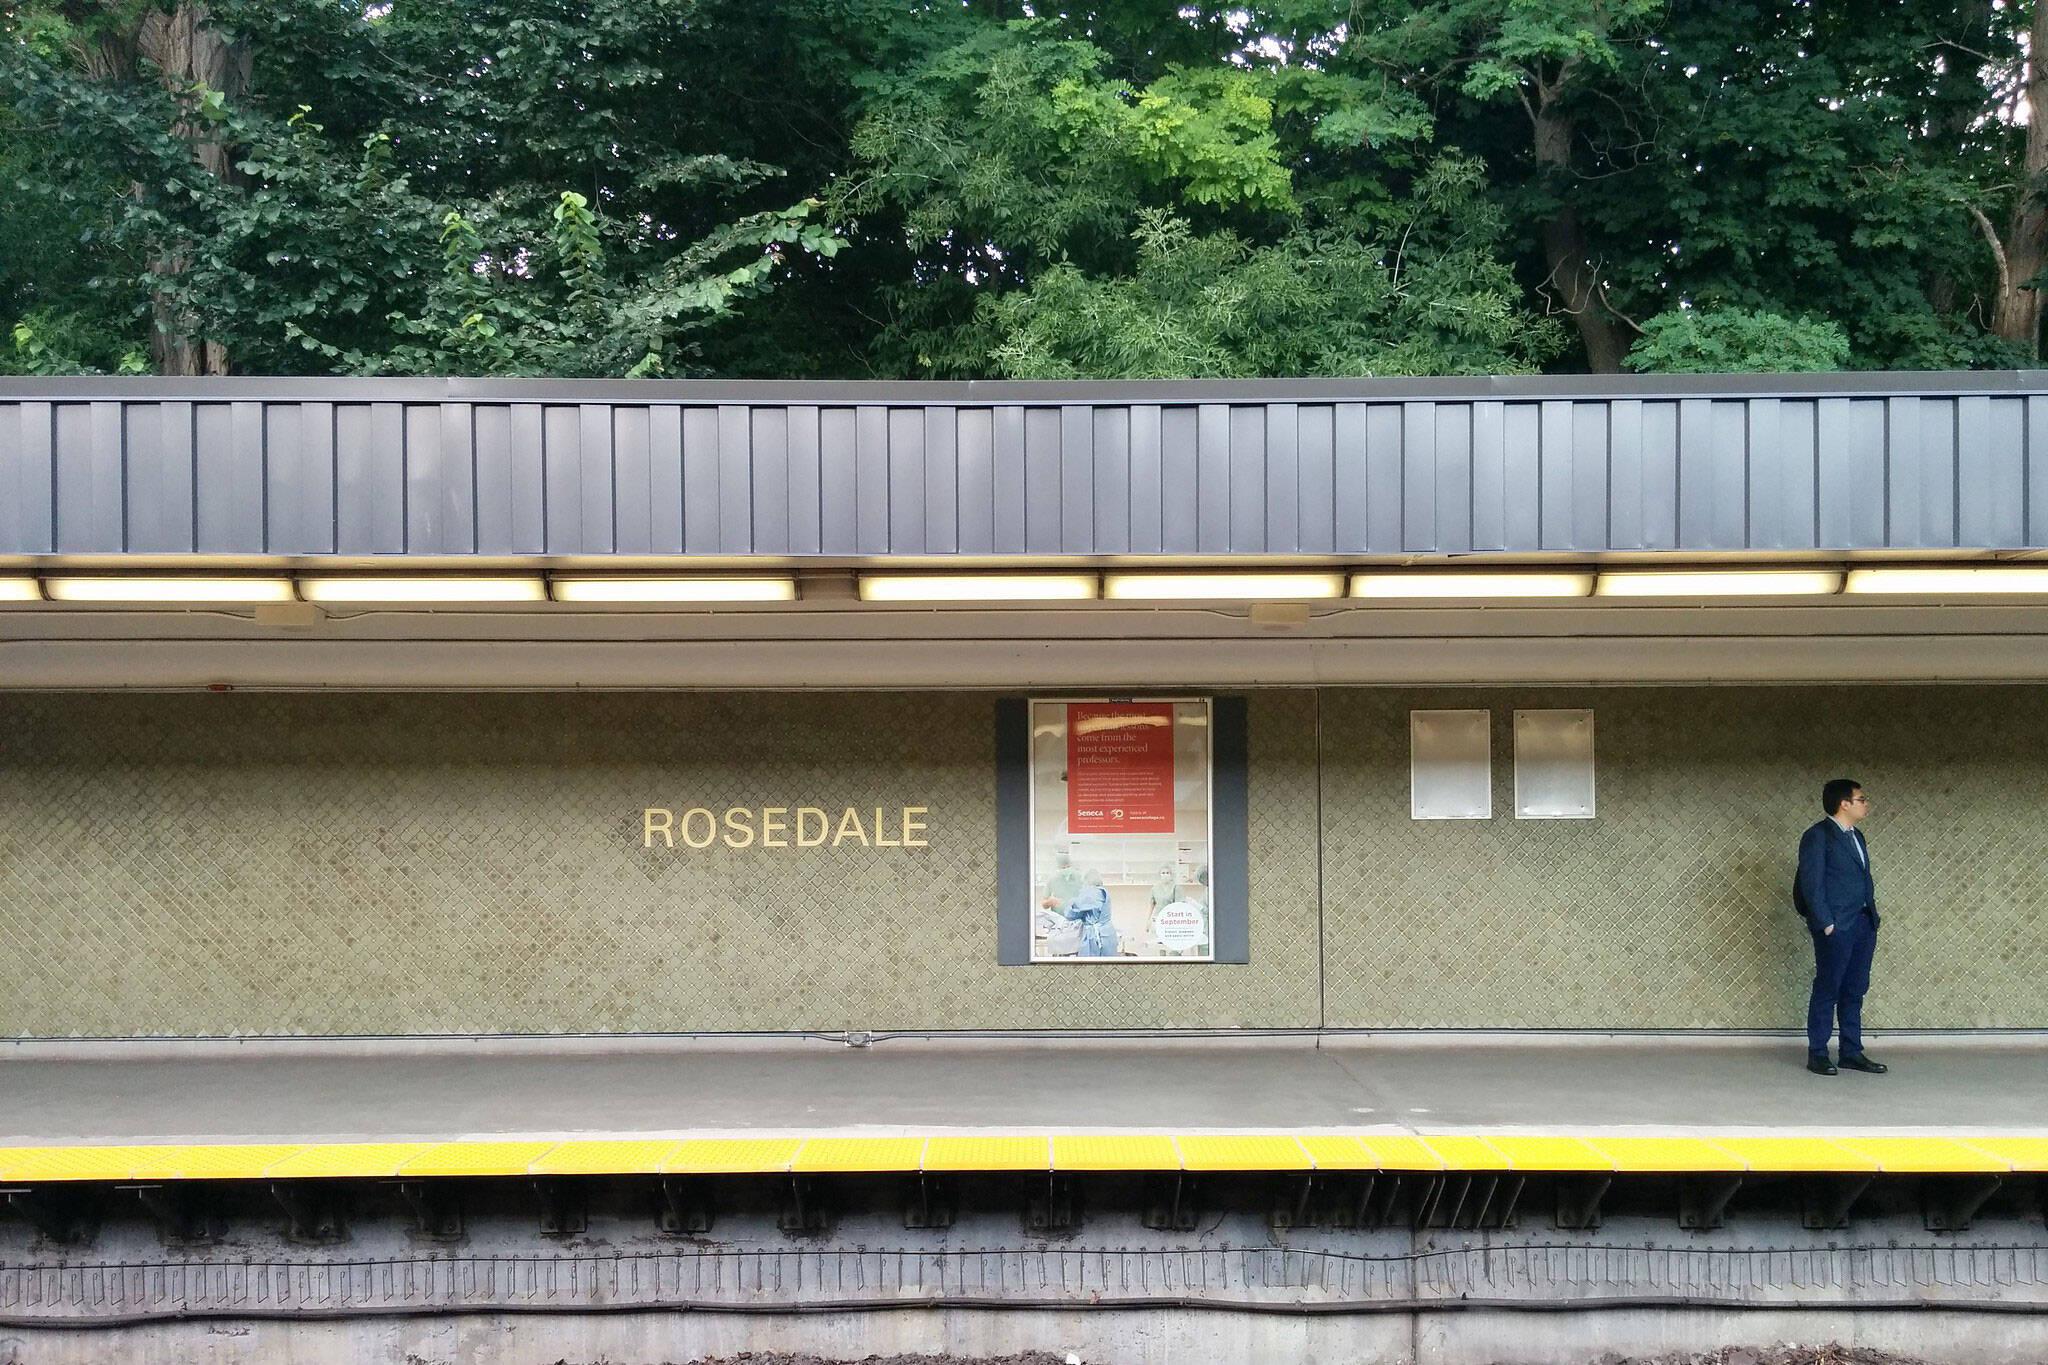 rosedale toronto